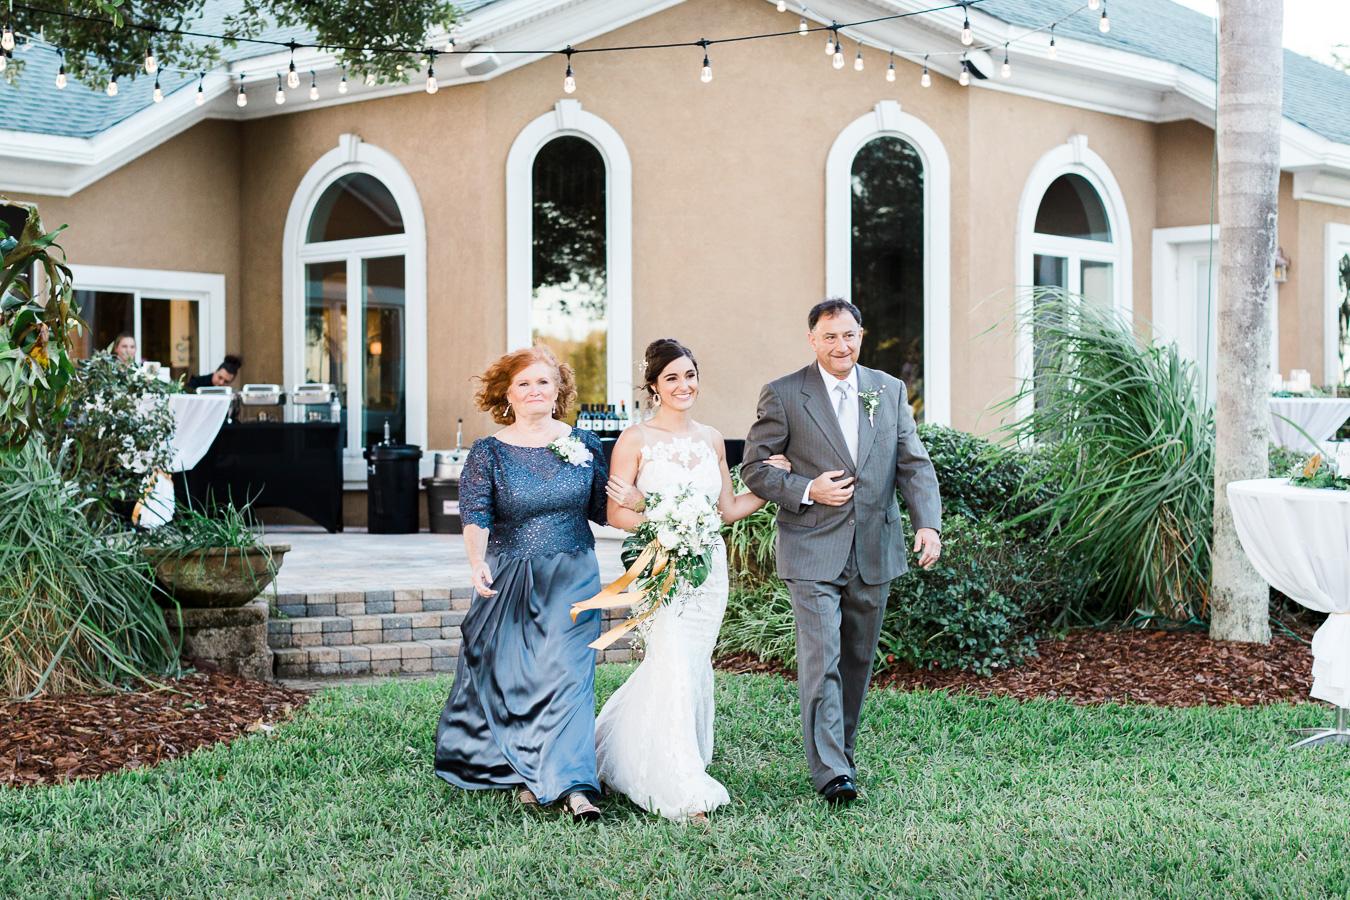 Wedding-photographer-orlando-66.jpg